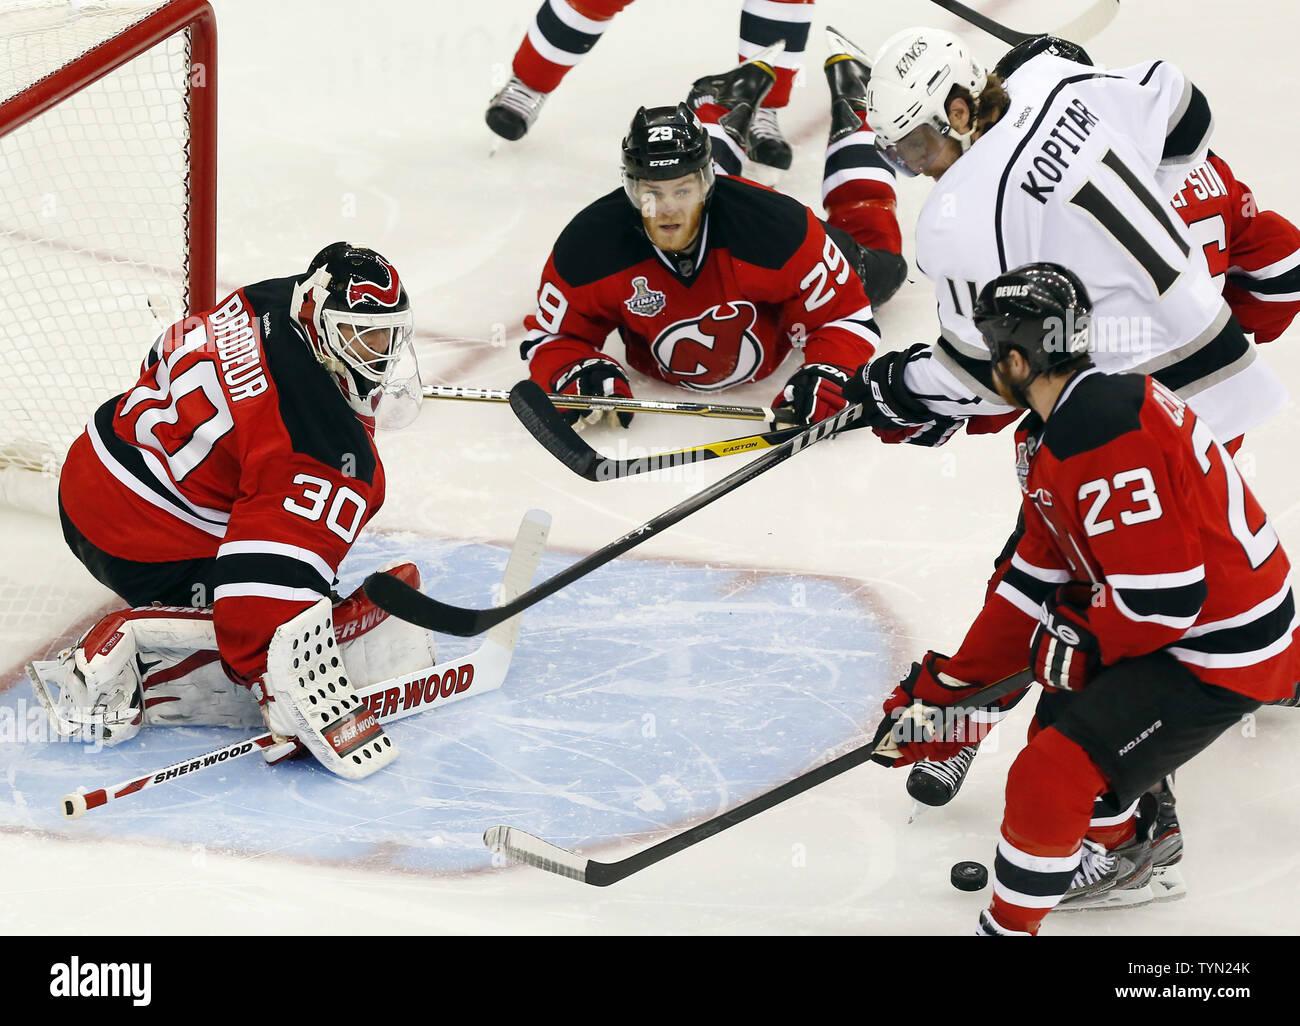 New Jersey Devils goalie Martin Brodeur stops a shot from